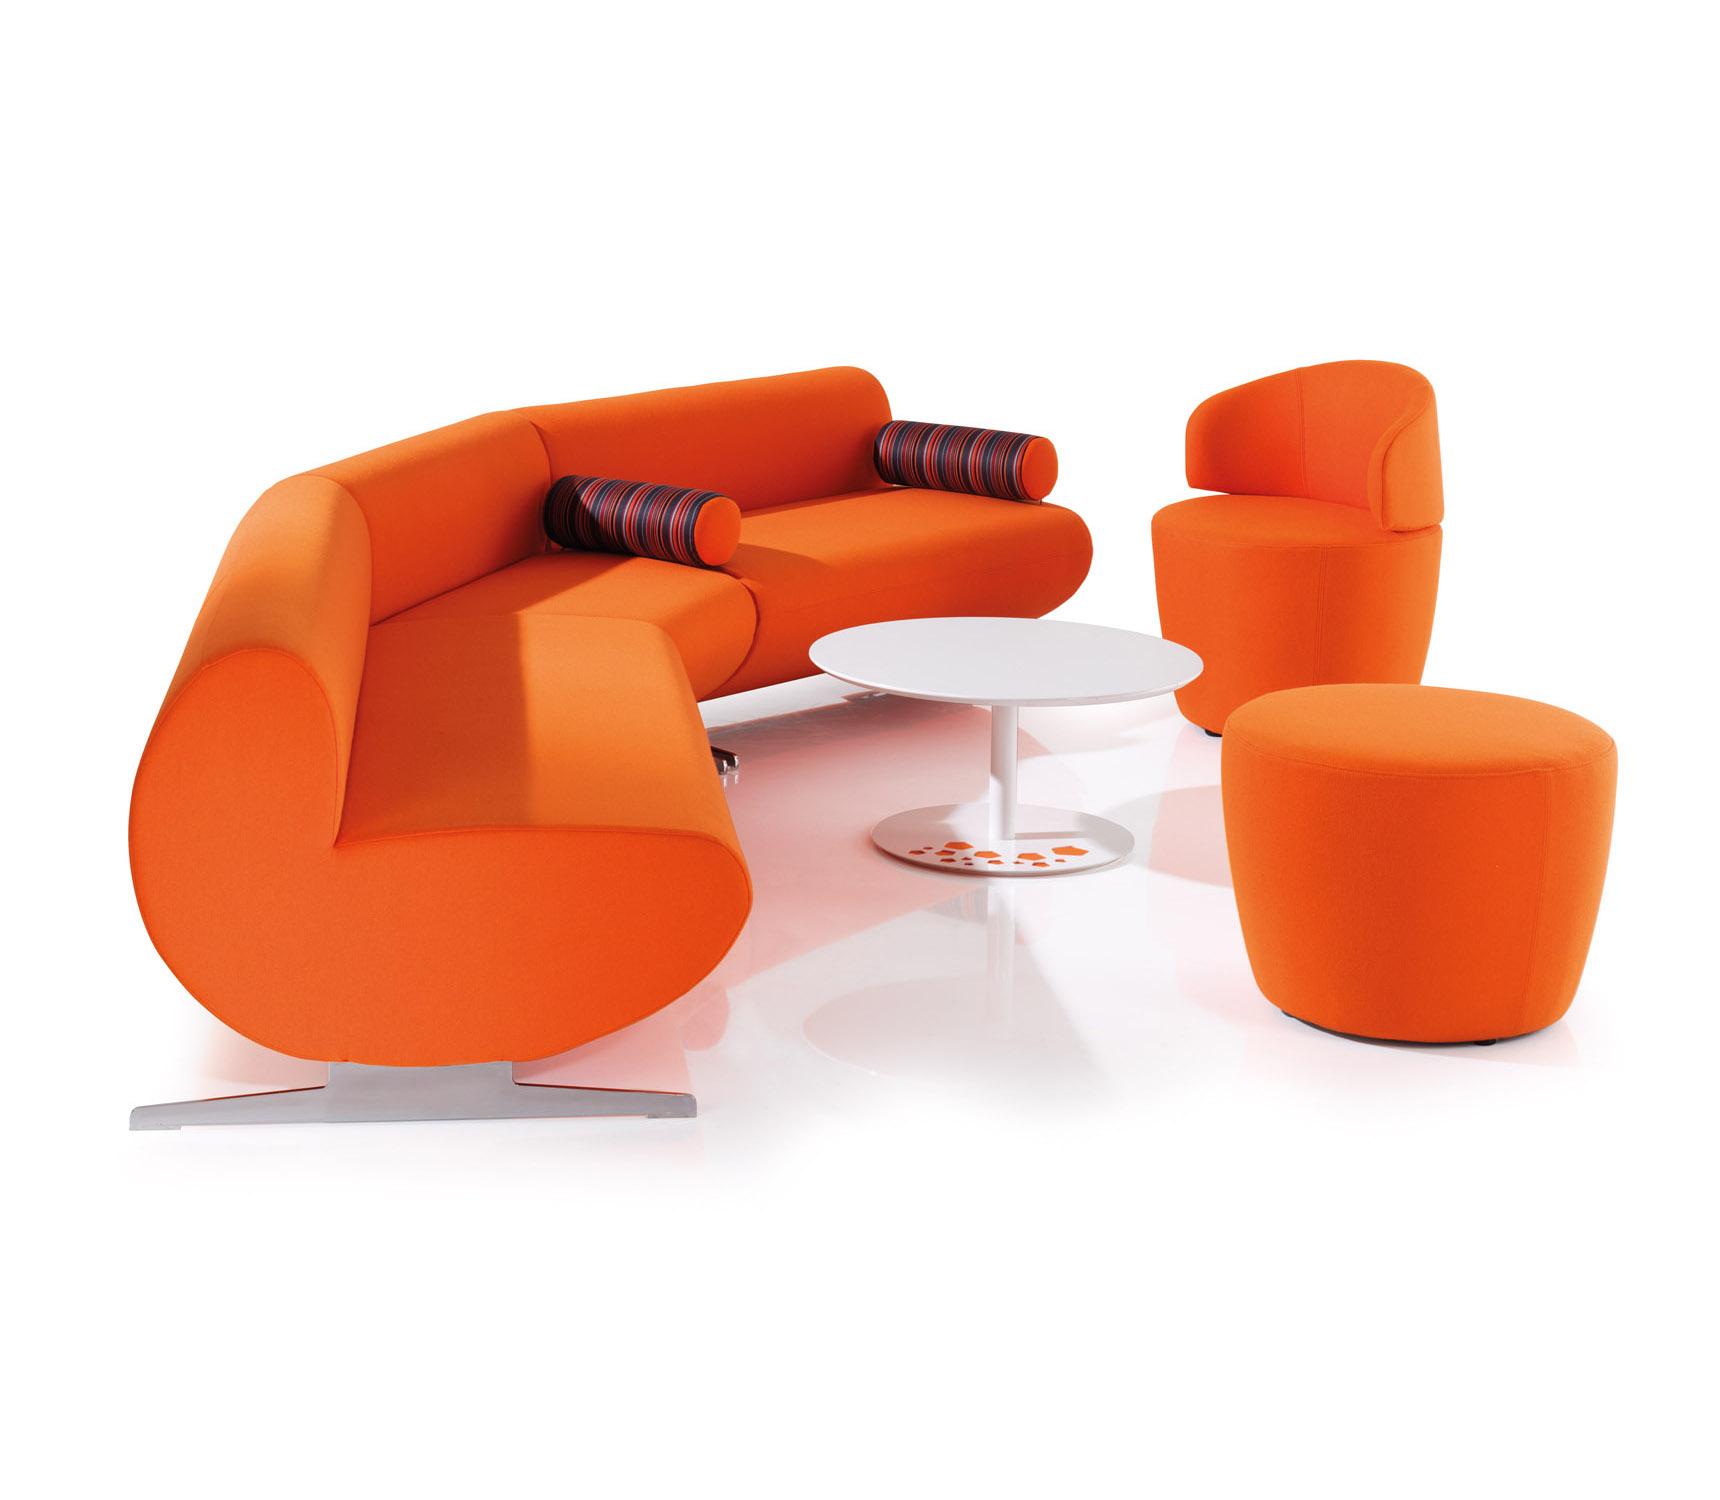 Marshmallow Modular Breakout Seating